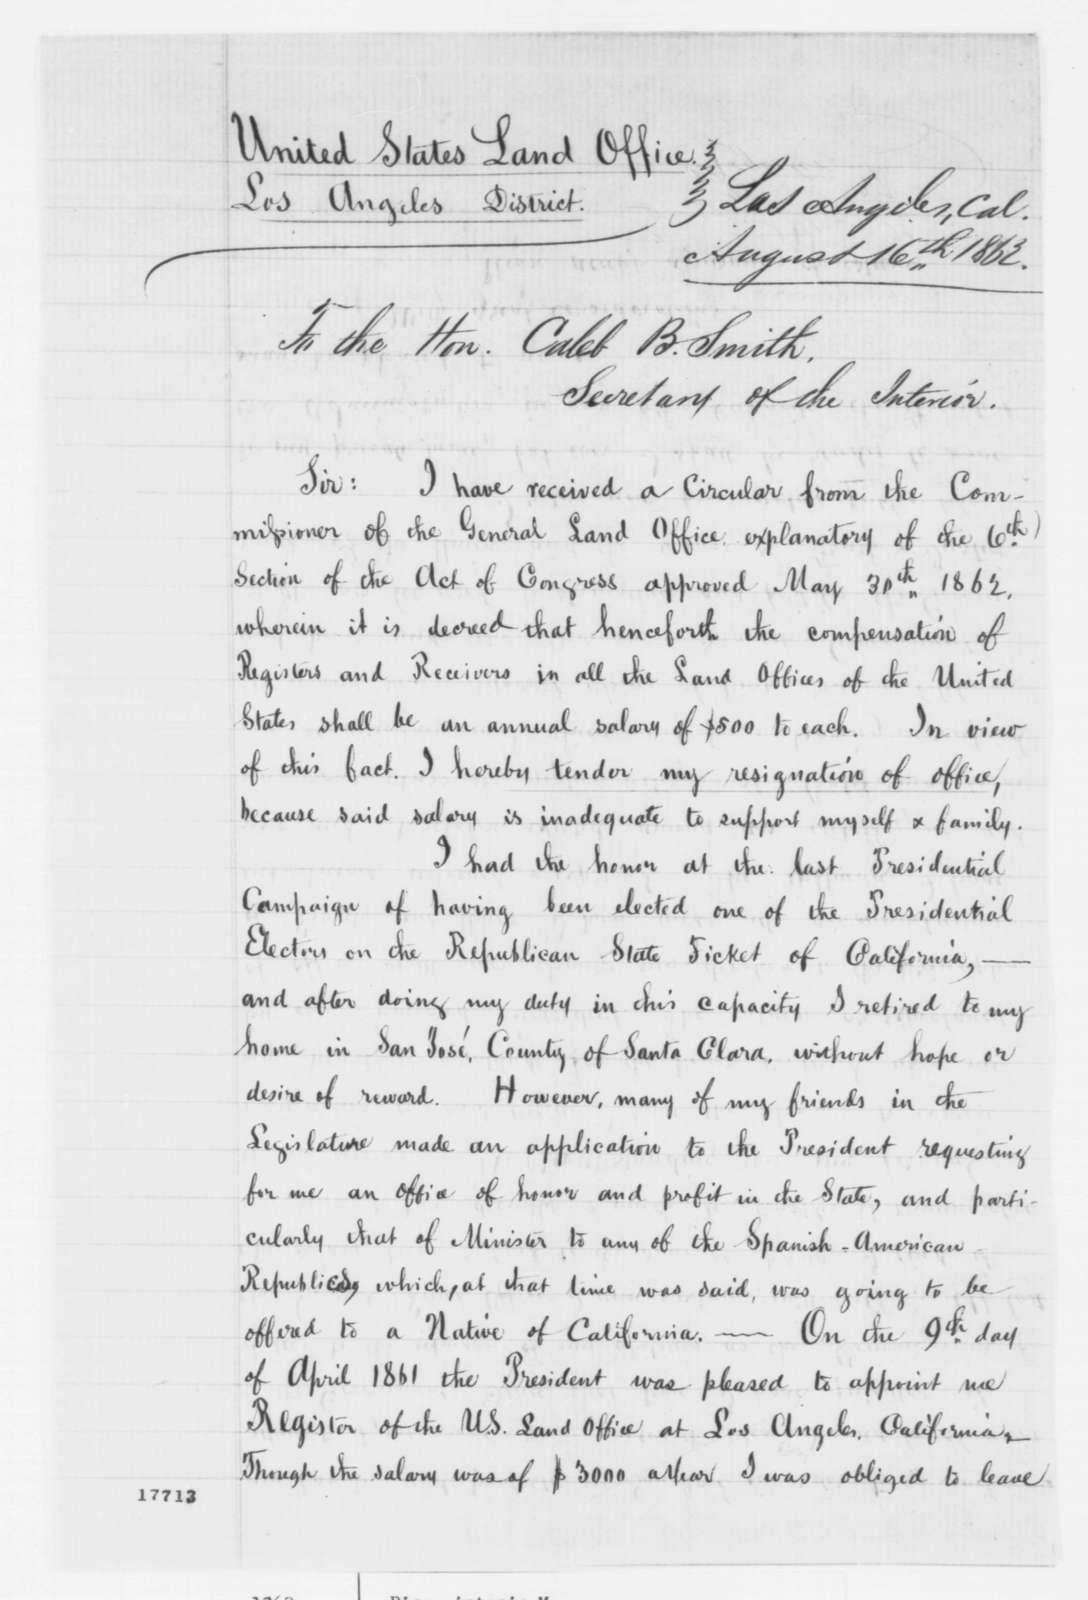 Antonio Maria Pico to Caleb B. Smith, Saturday, August 16, 1862  (Resignation; endorsed by Caleb Smith)